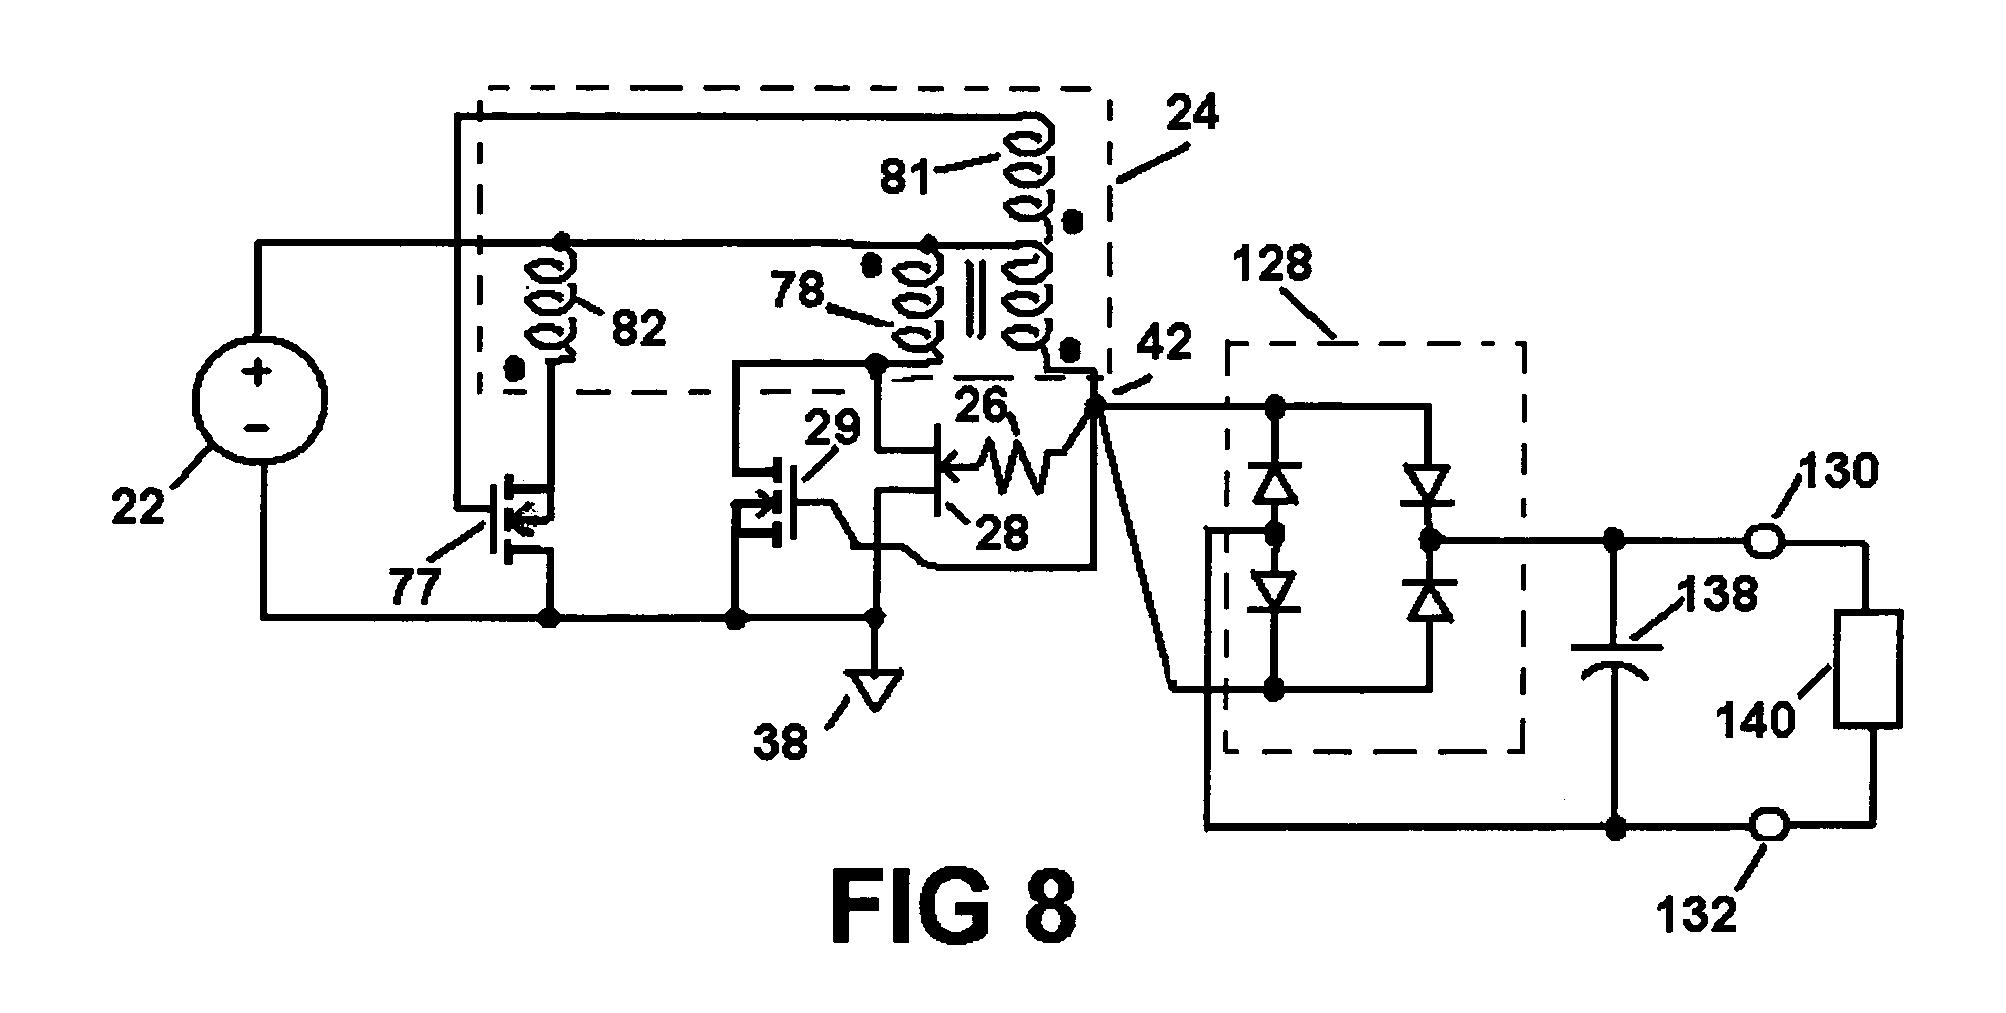 Highvoltage Generator Circuit Diagram Tradeoficcom Wiring Low Battery Indicator Us20100208498 Ultra Voltage Boost